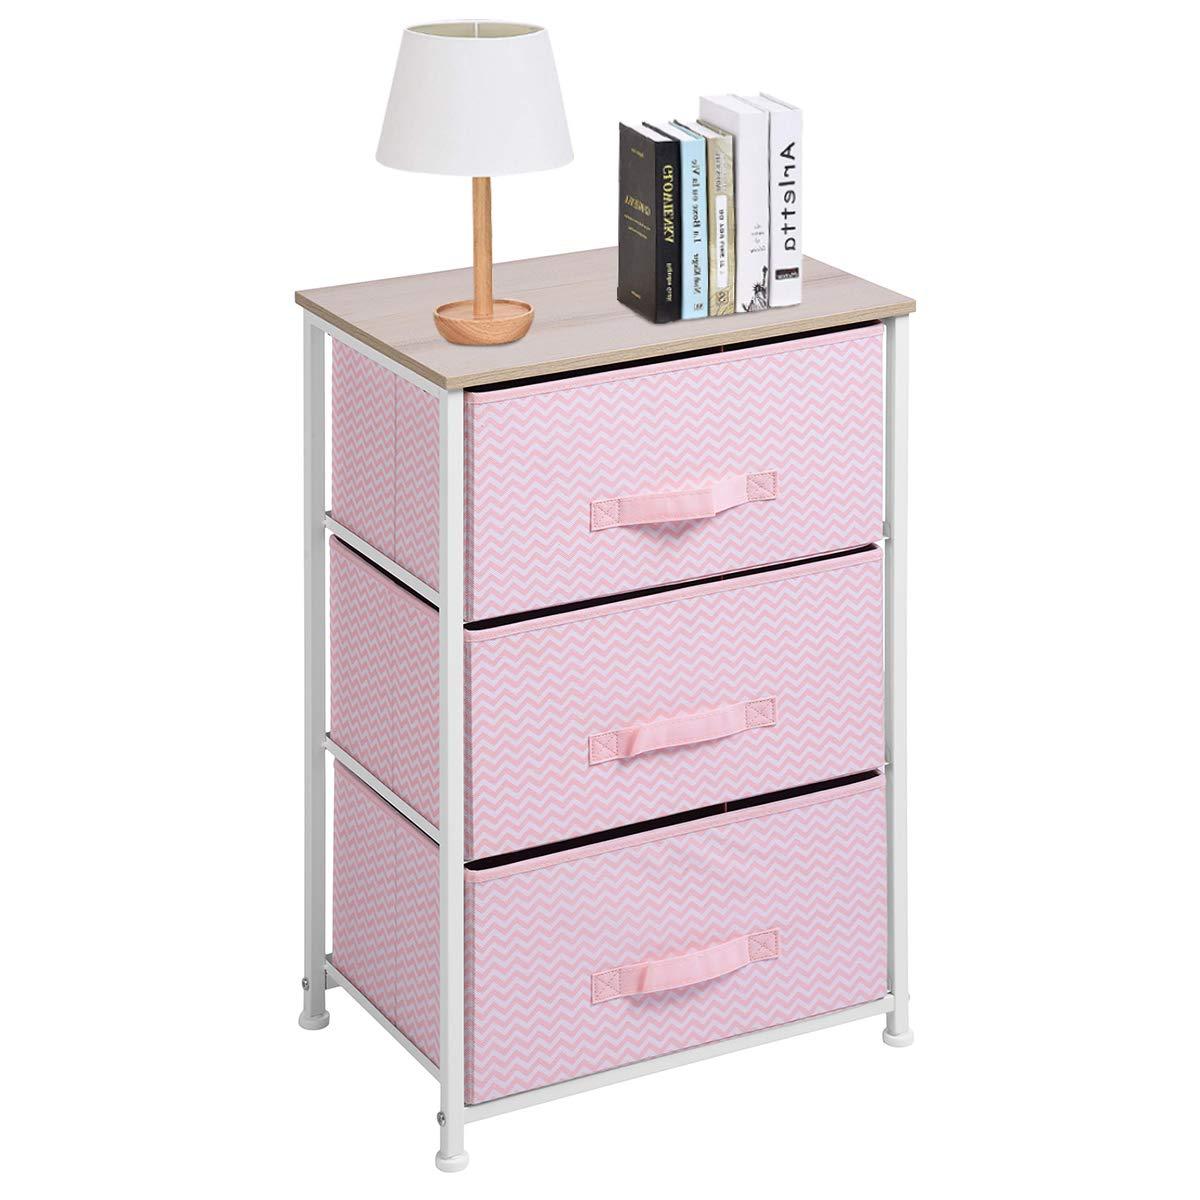 Amazon.com: Aingoo - Mueble organizador de mesa con cajones ...